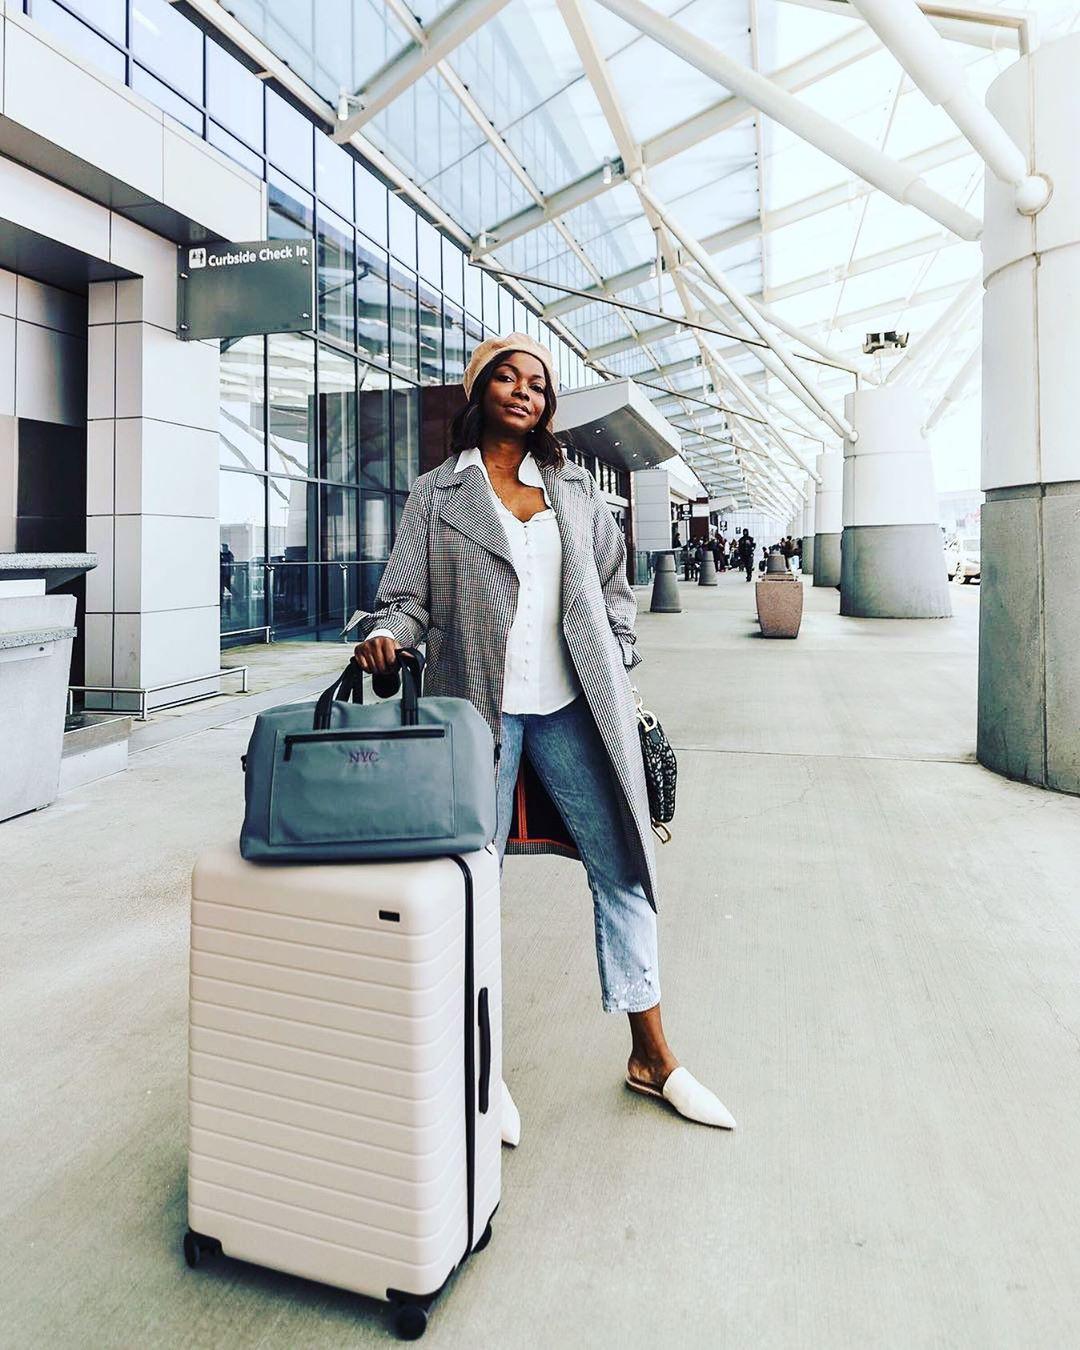 Big Away Carry-On Luggage